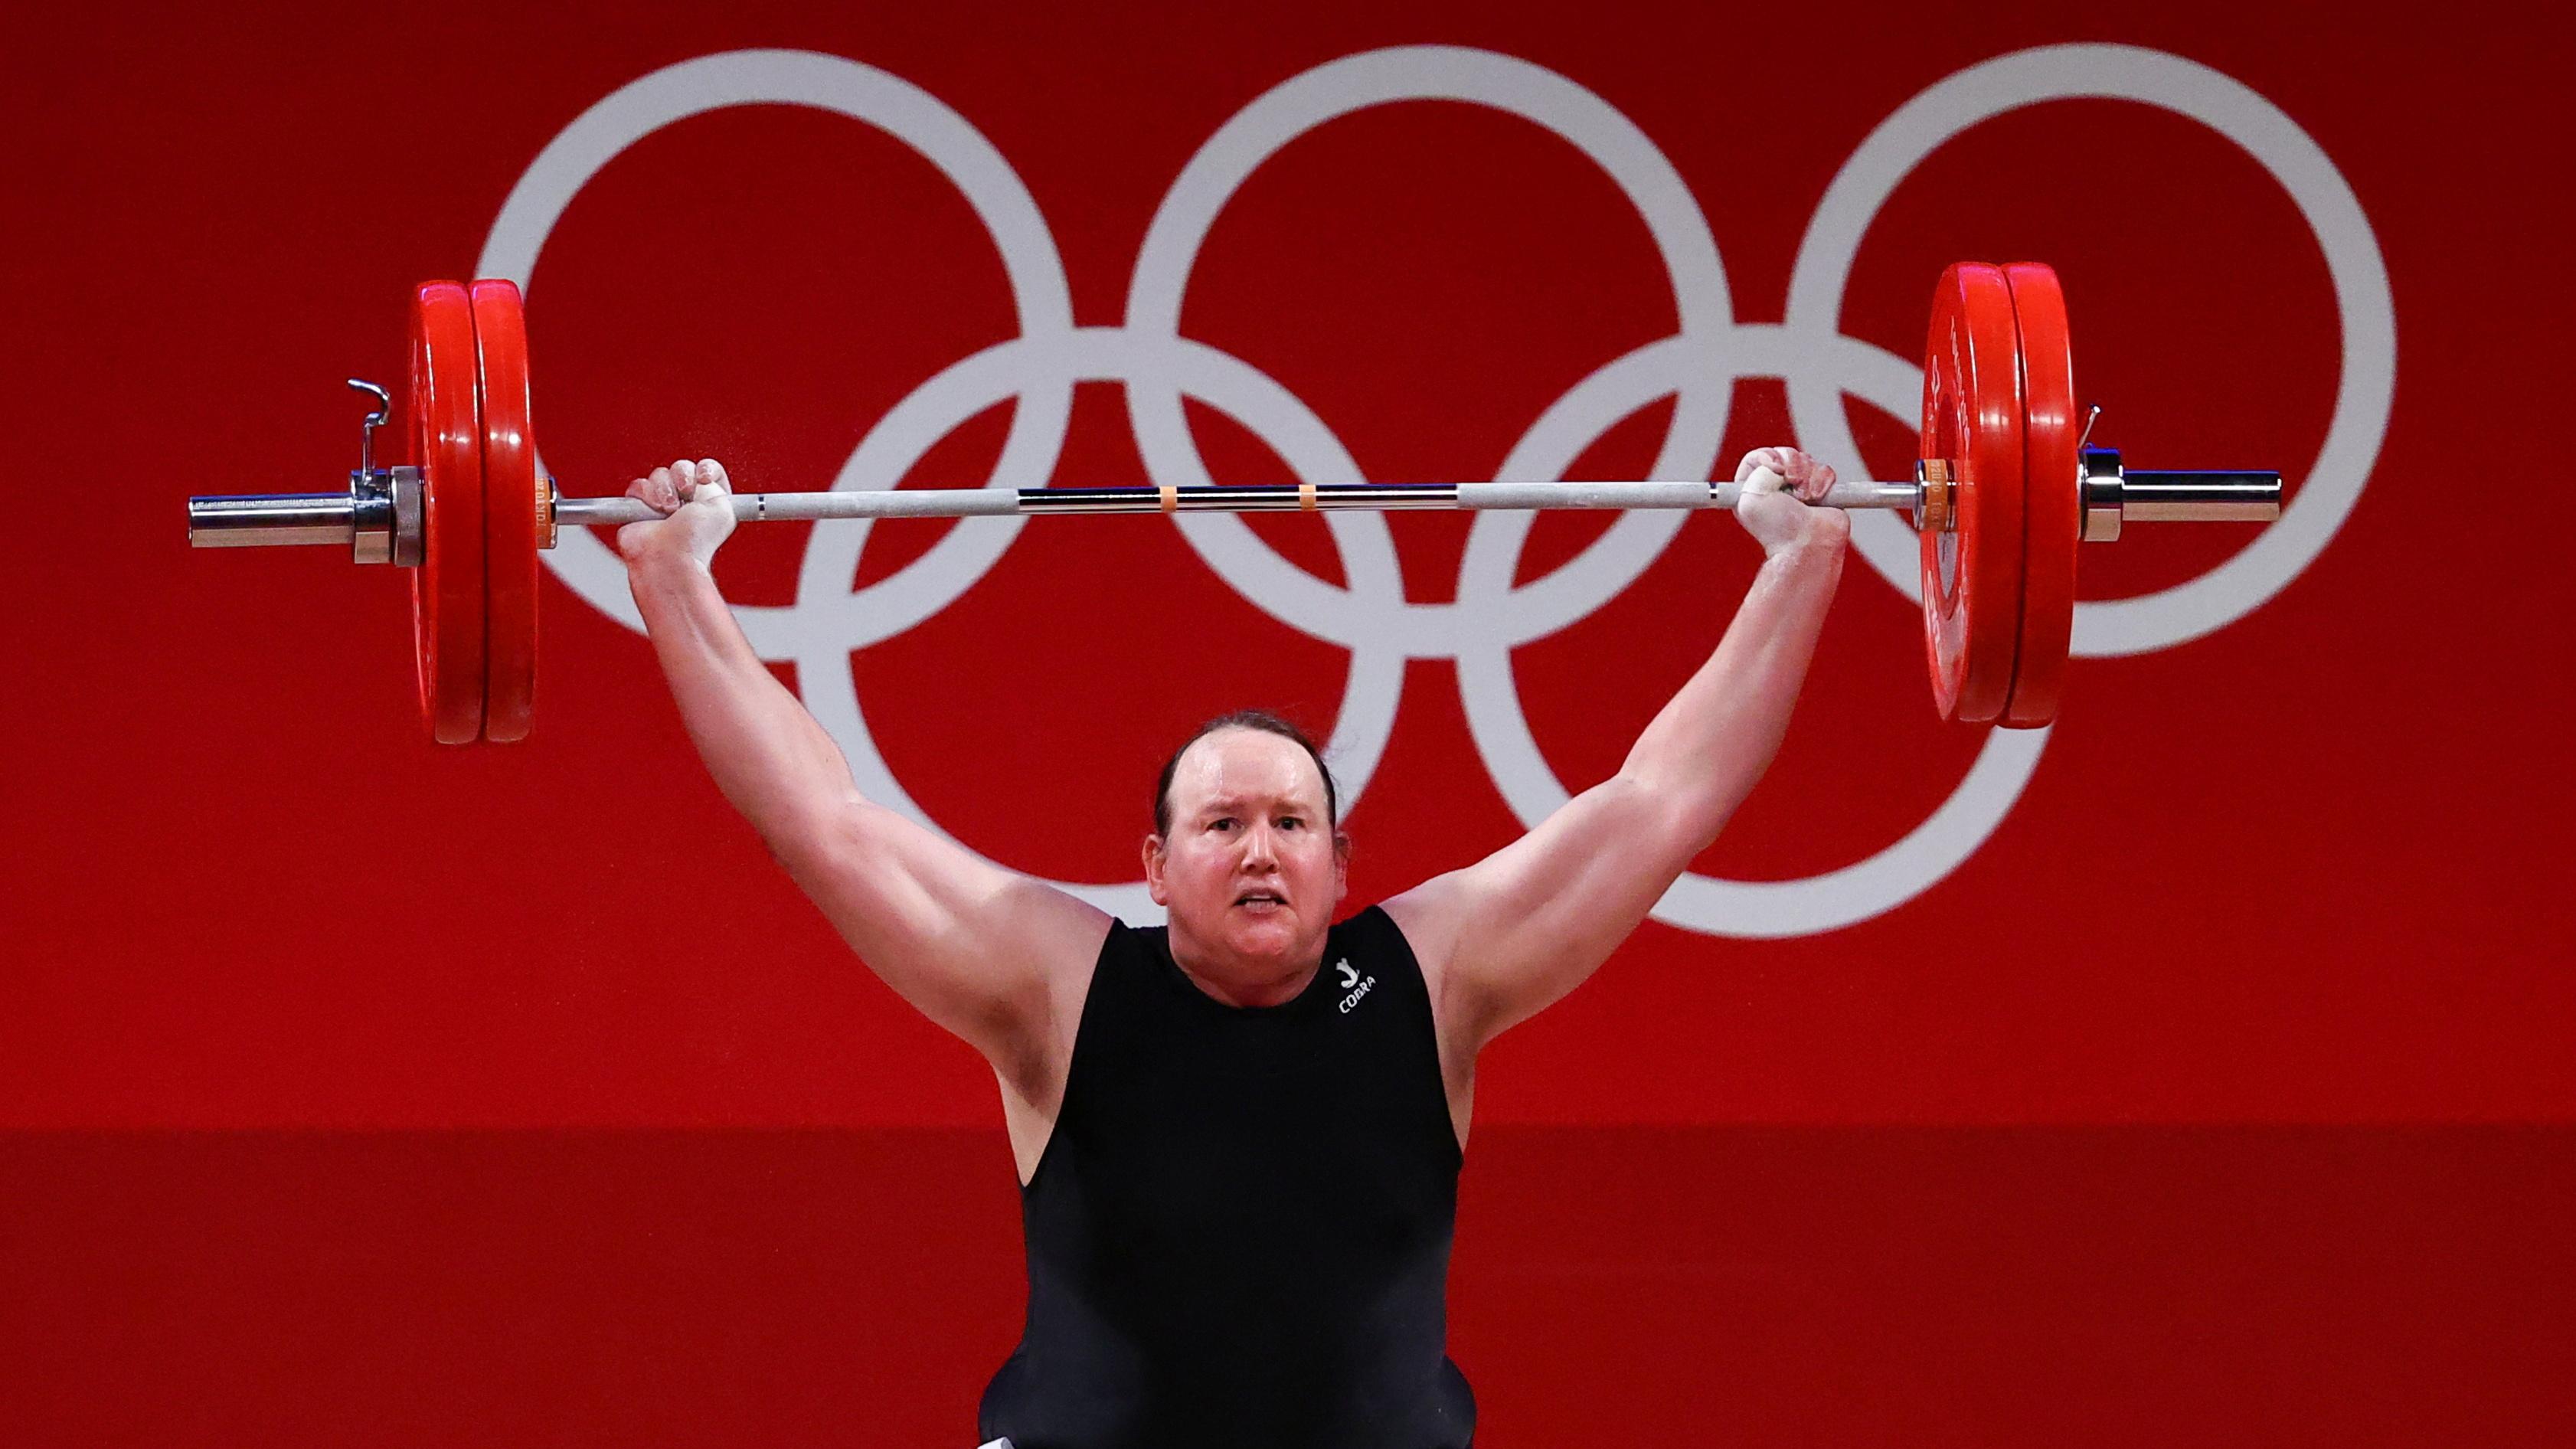 Tokyo 2020 Olympics - Weightlifting - Women's +87kg - Group A - Tokyo International Forum, Tokyo, Japan - August 2, 2021. Laurel Hubbard of New Zealand in action. REUTERS/Edgard Garrido